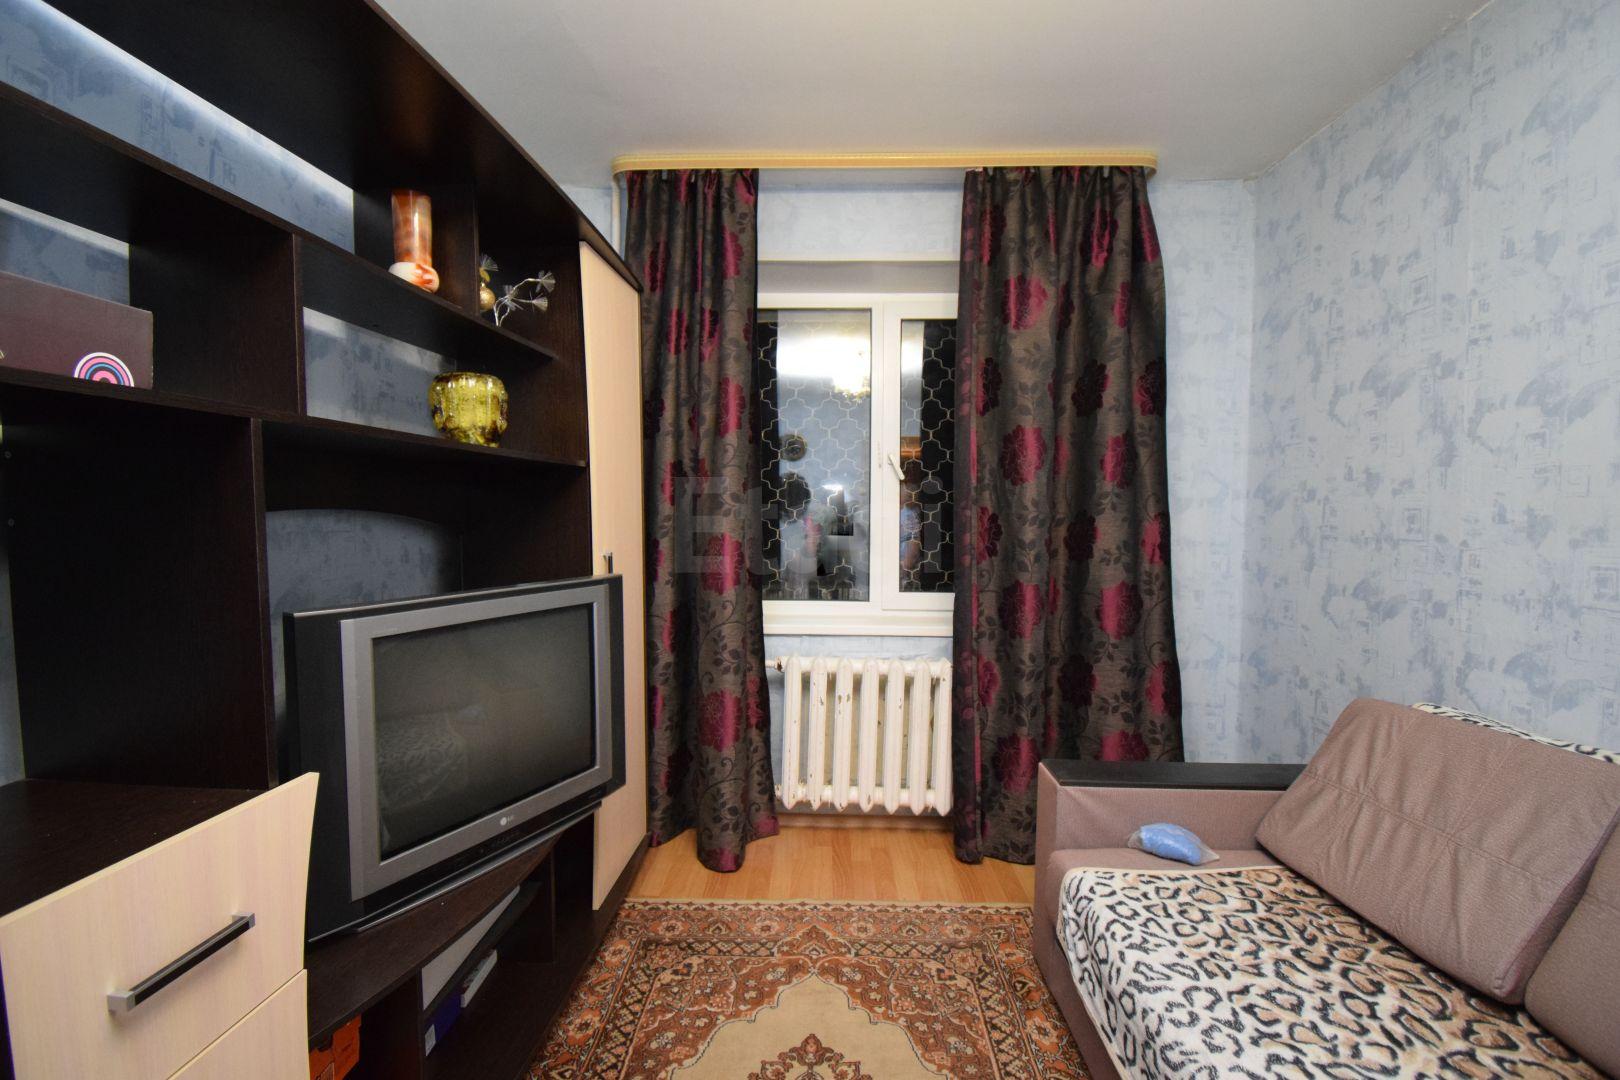 Продается однокомнатная квартира за 1 630 000 рублей. 3 мкр., ул. Доронина (1.6 км до центра).